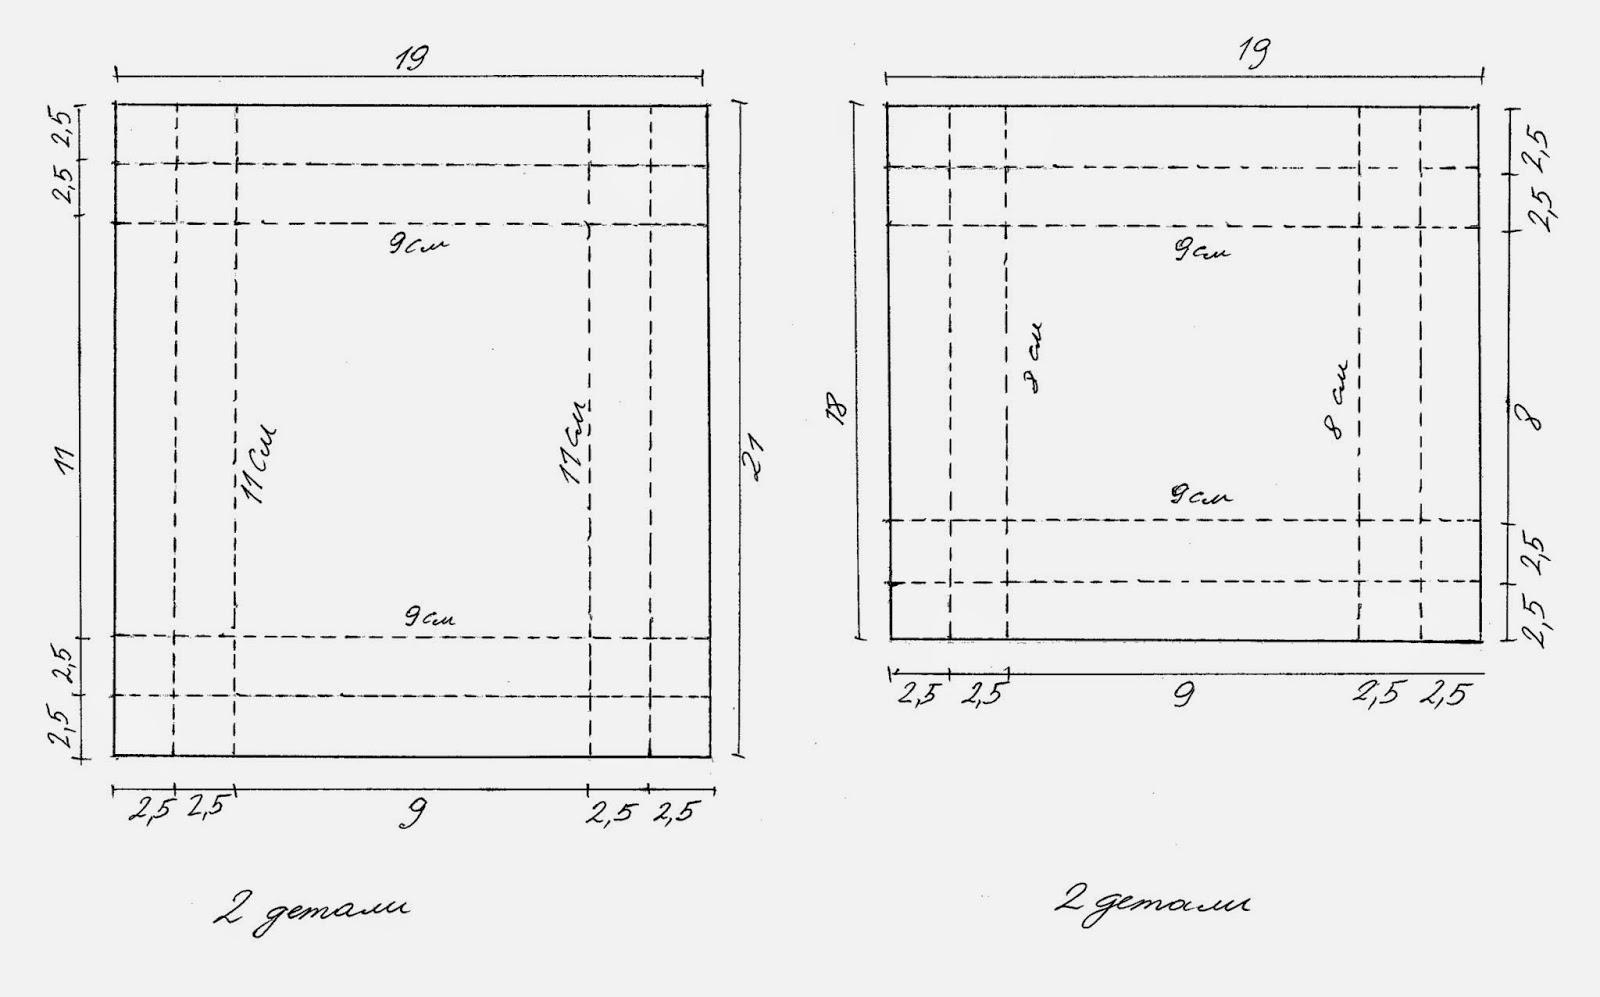 схема бонбоньерка карета